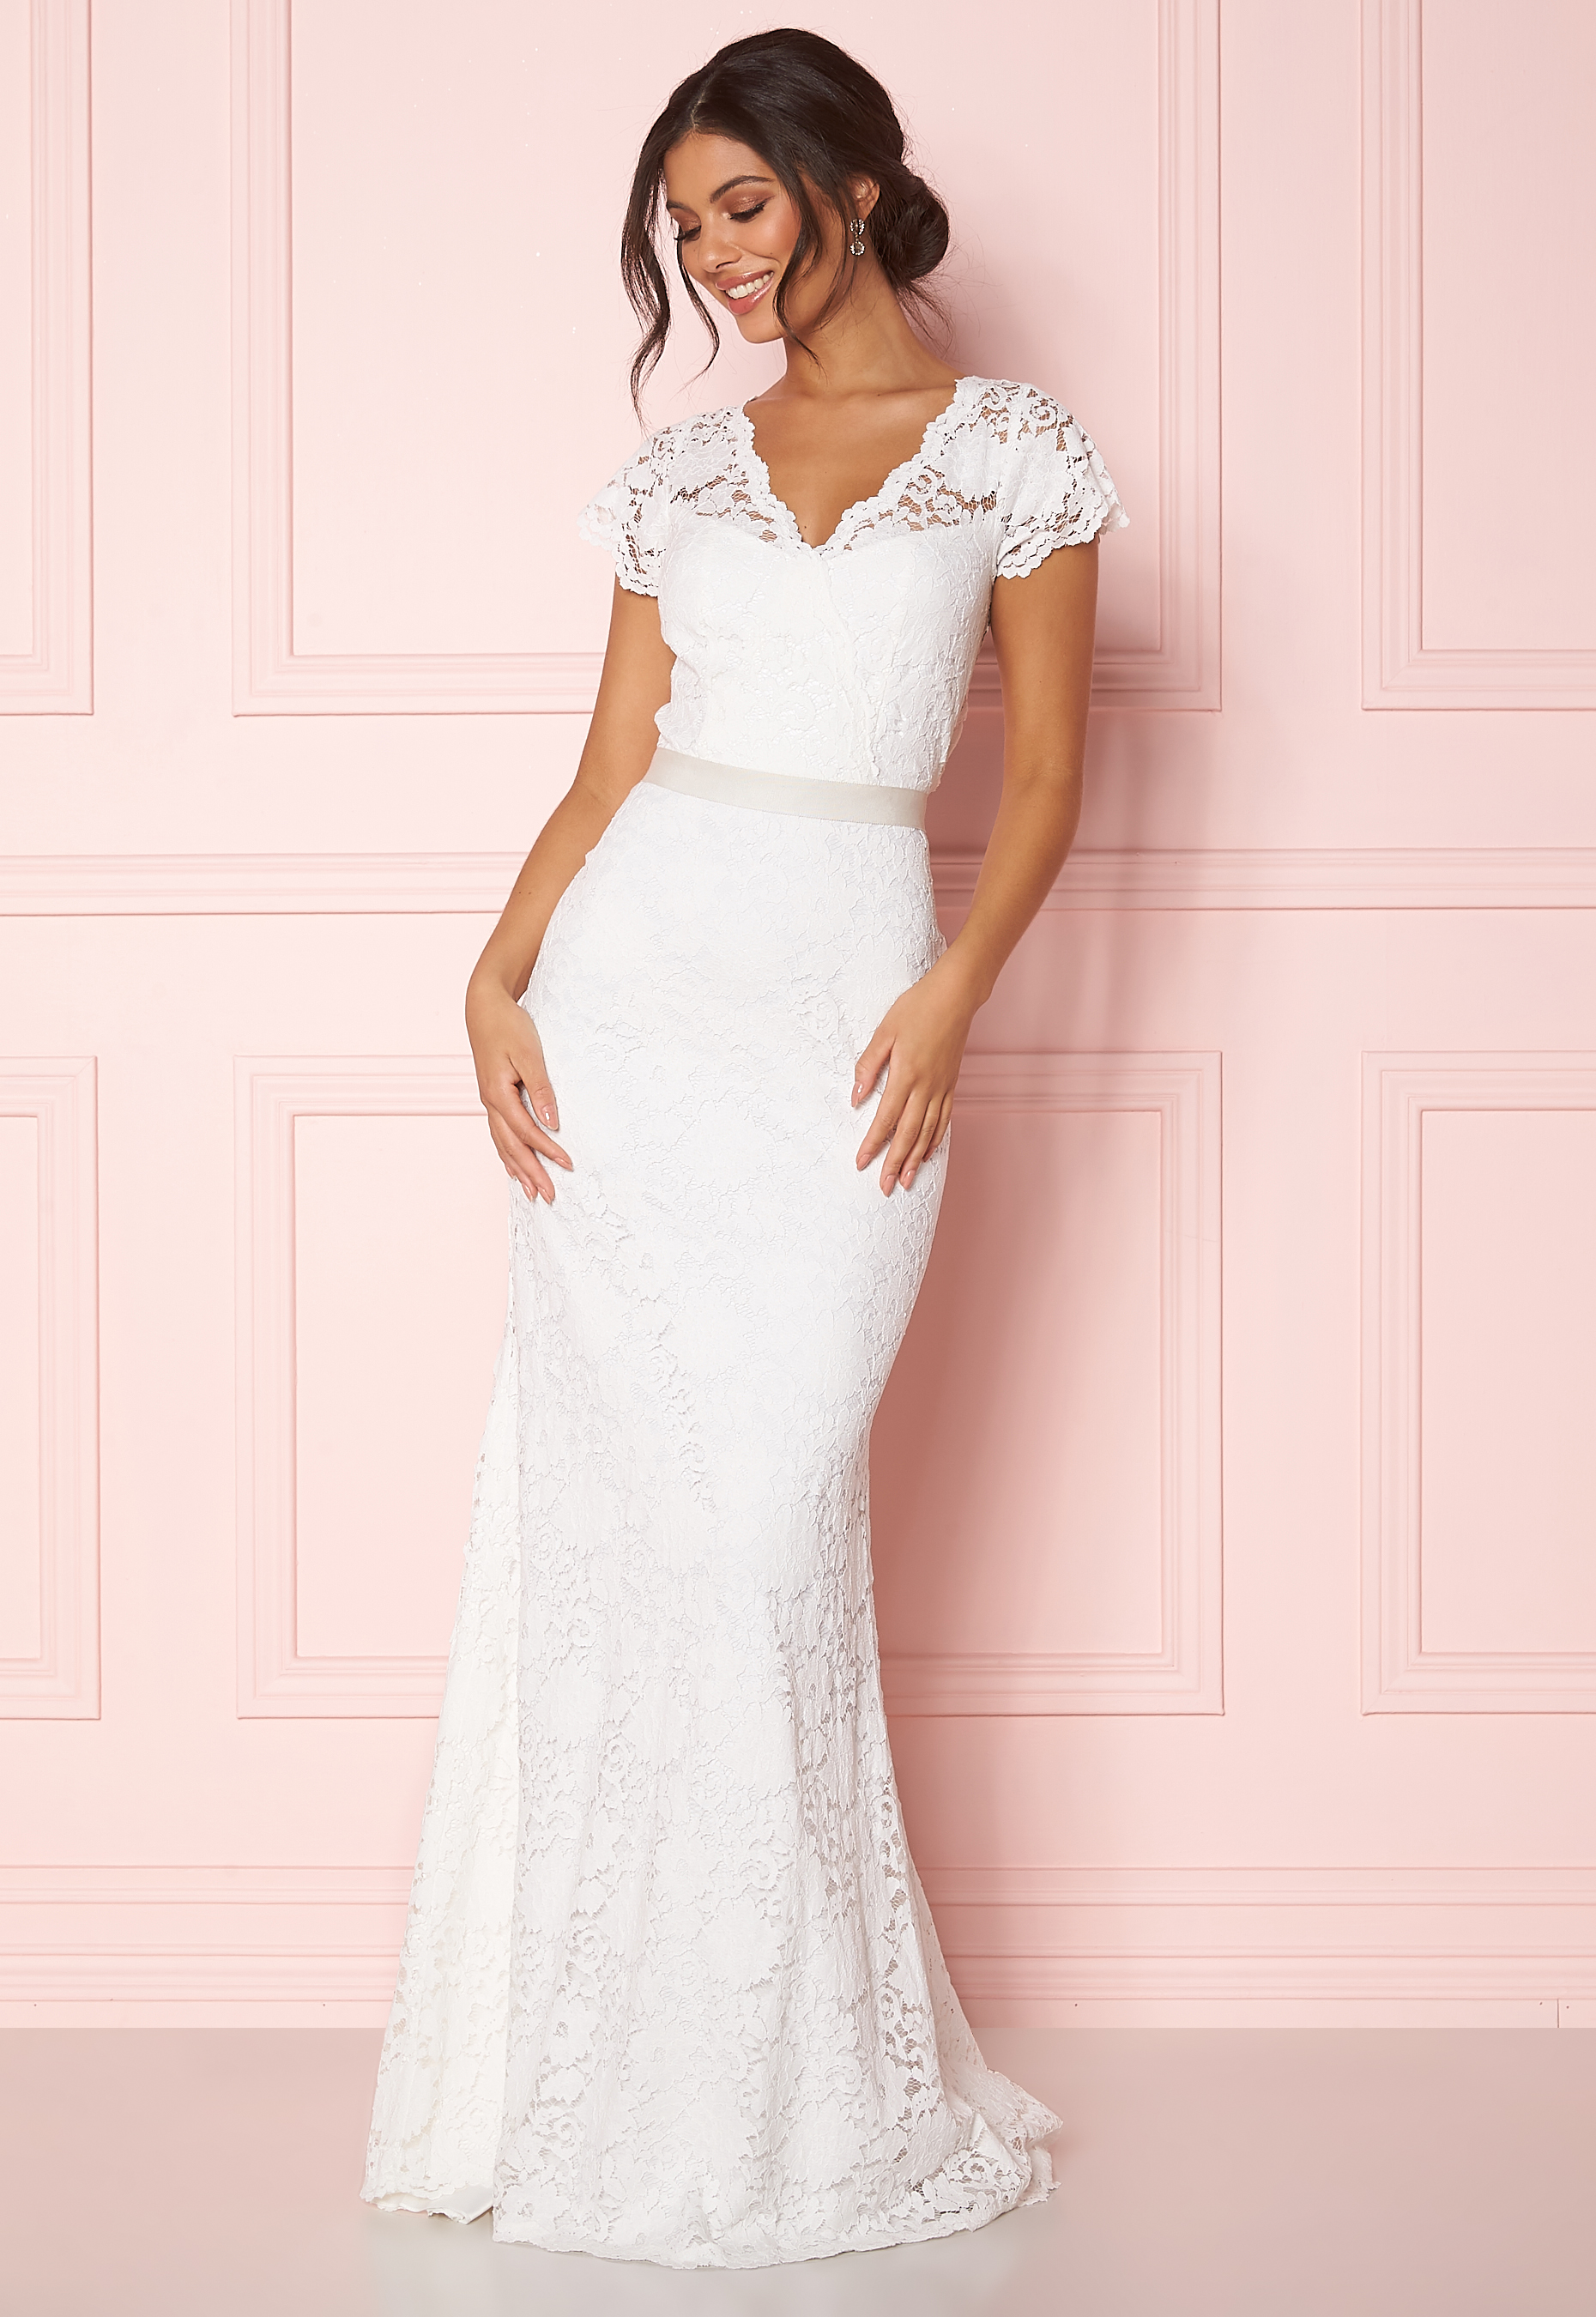 12aaa75d624c Zetterberg Couture Ashley Dress Ivory - Bubbleroom